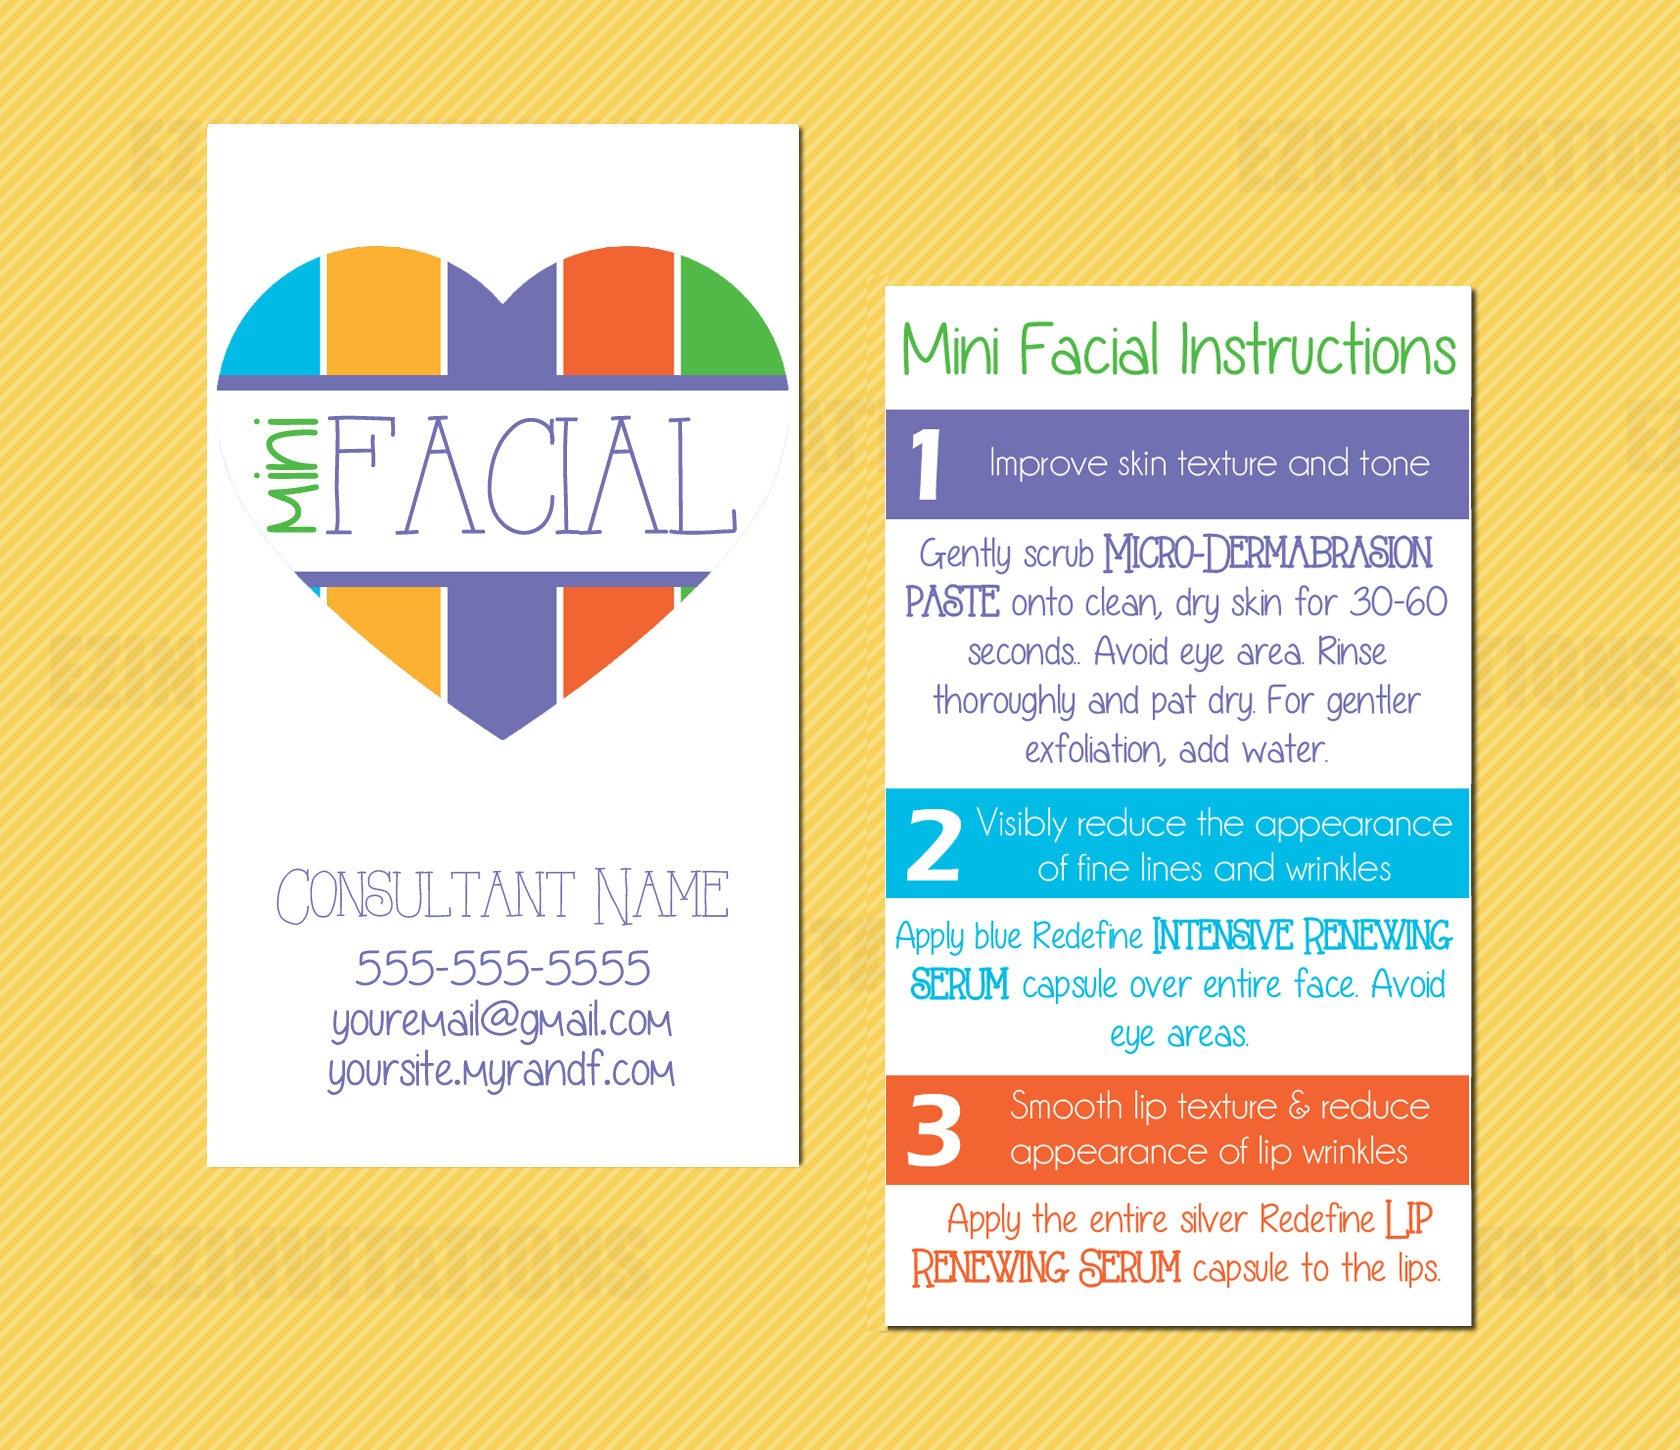 Rodan And Fields Mini Facial Card Rf Mini Facial Heart | Etsy - Rodan And Fields Mini Facial Instructions Printable Free